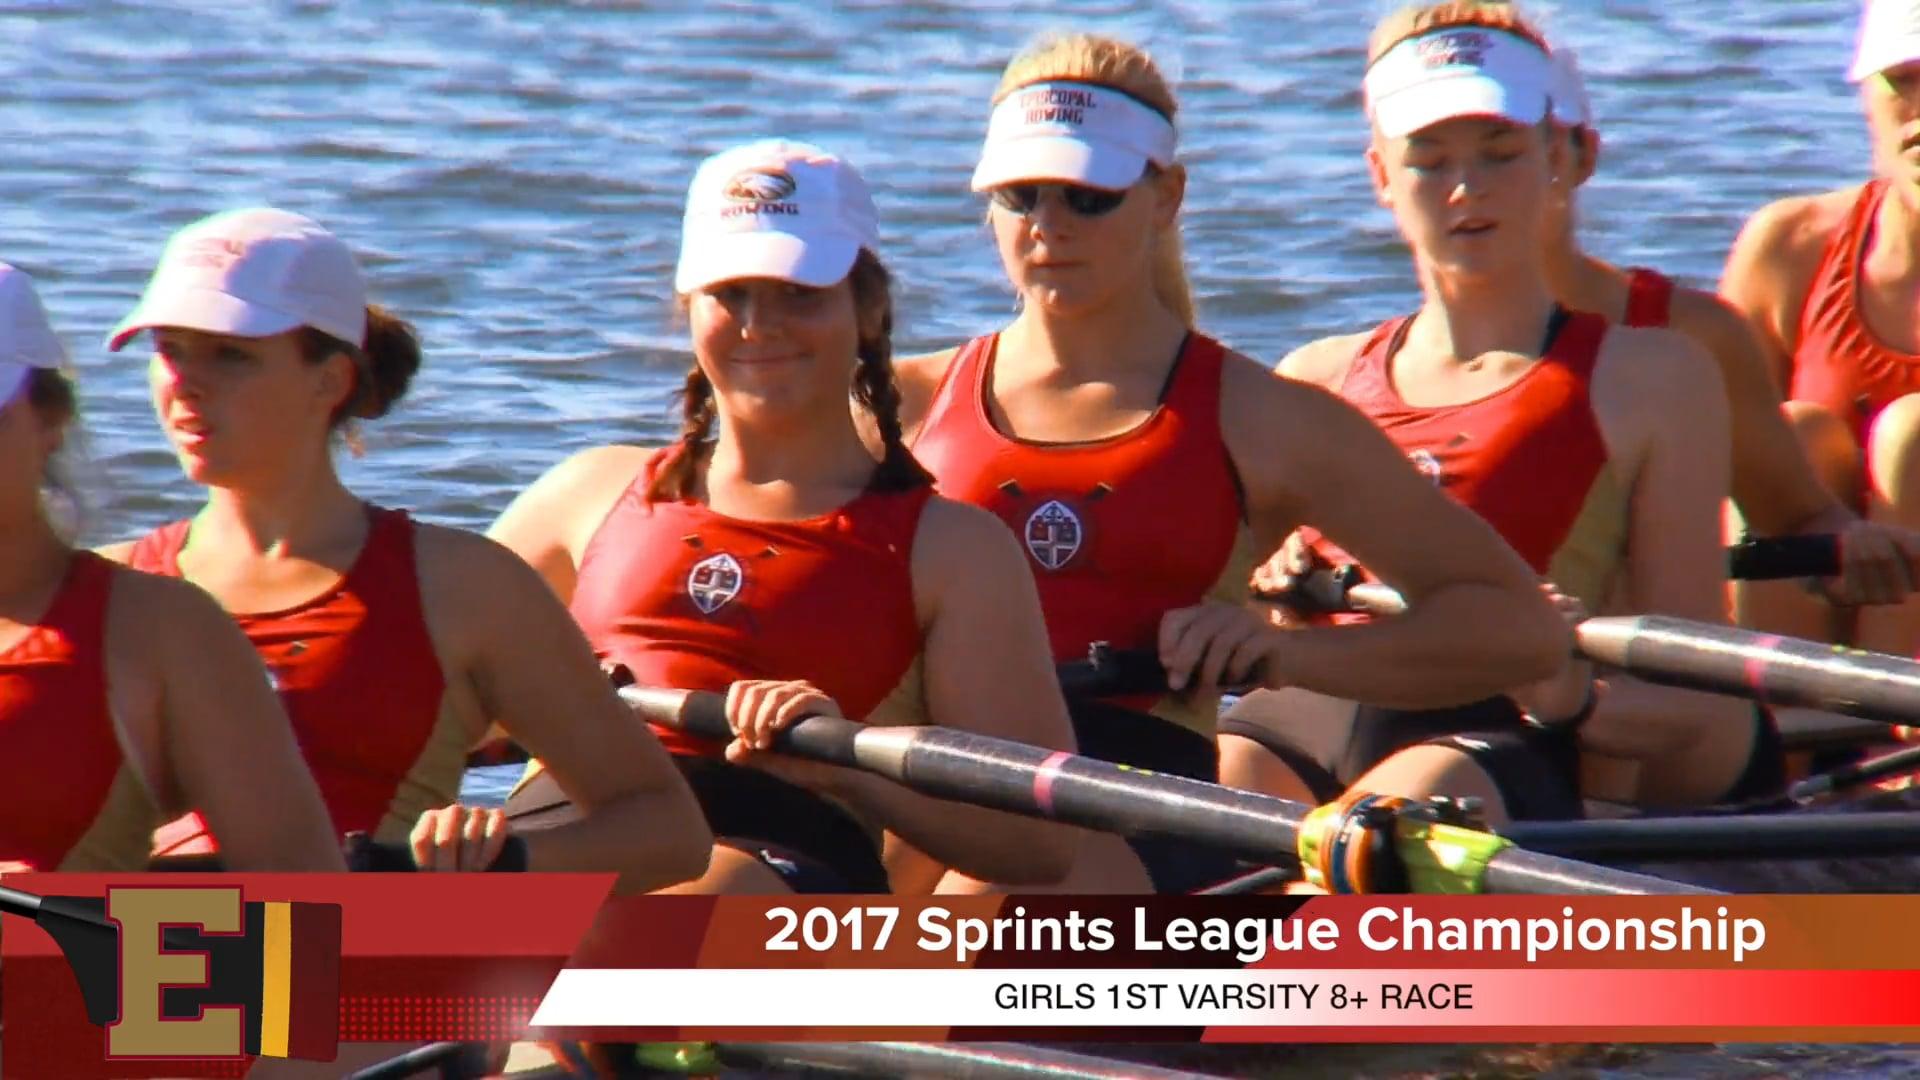 Girls 1st Varsity Race 2017 Sprints League Championship